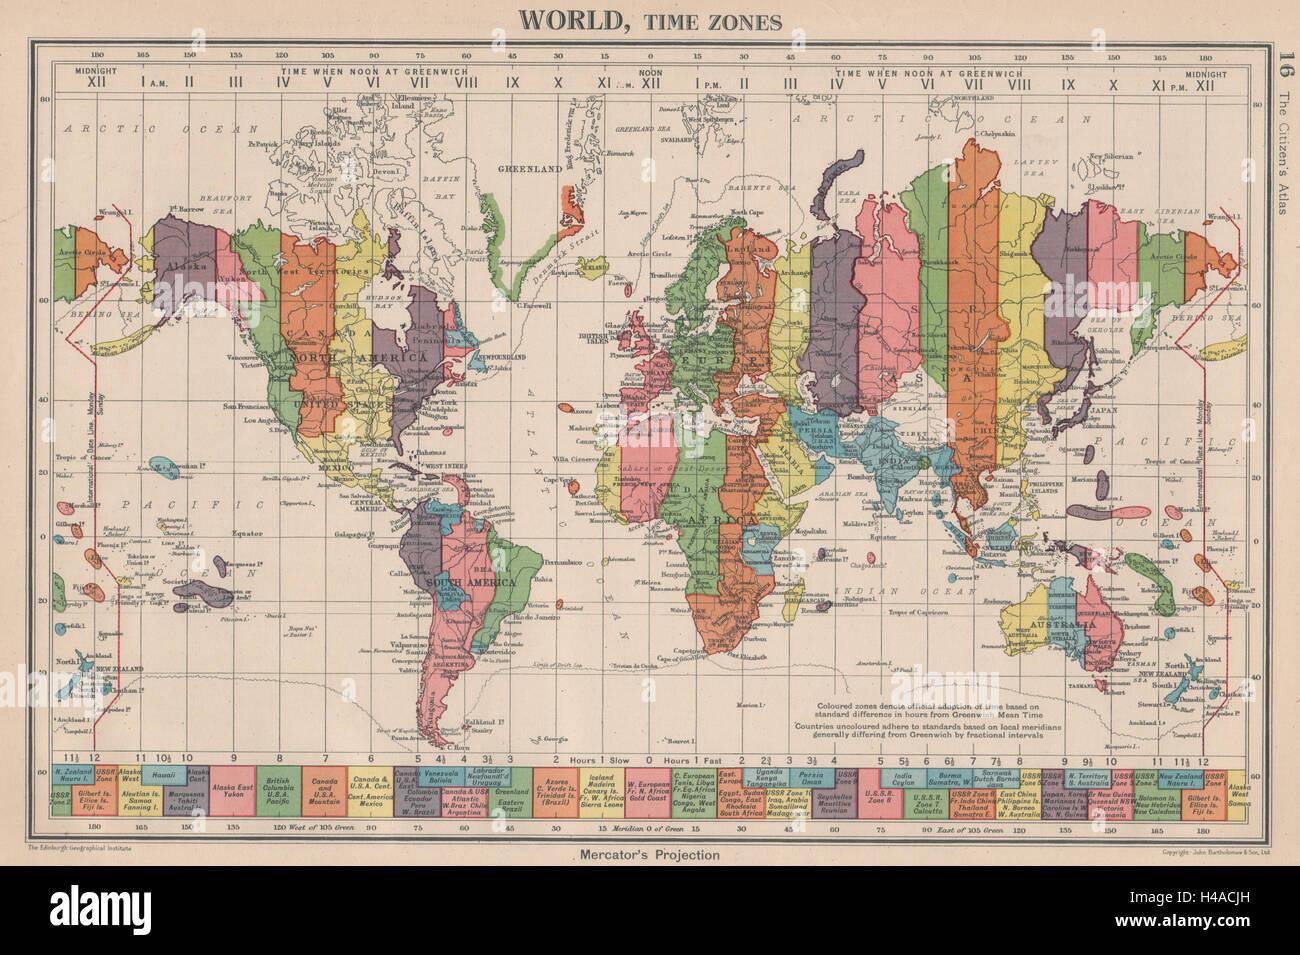 WORLD Time Zones UK Ireland Spain France on same zone Stock